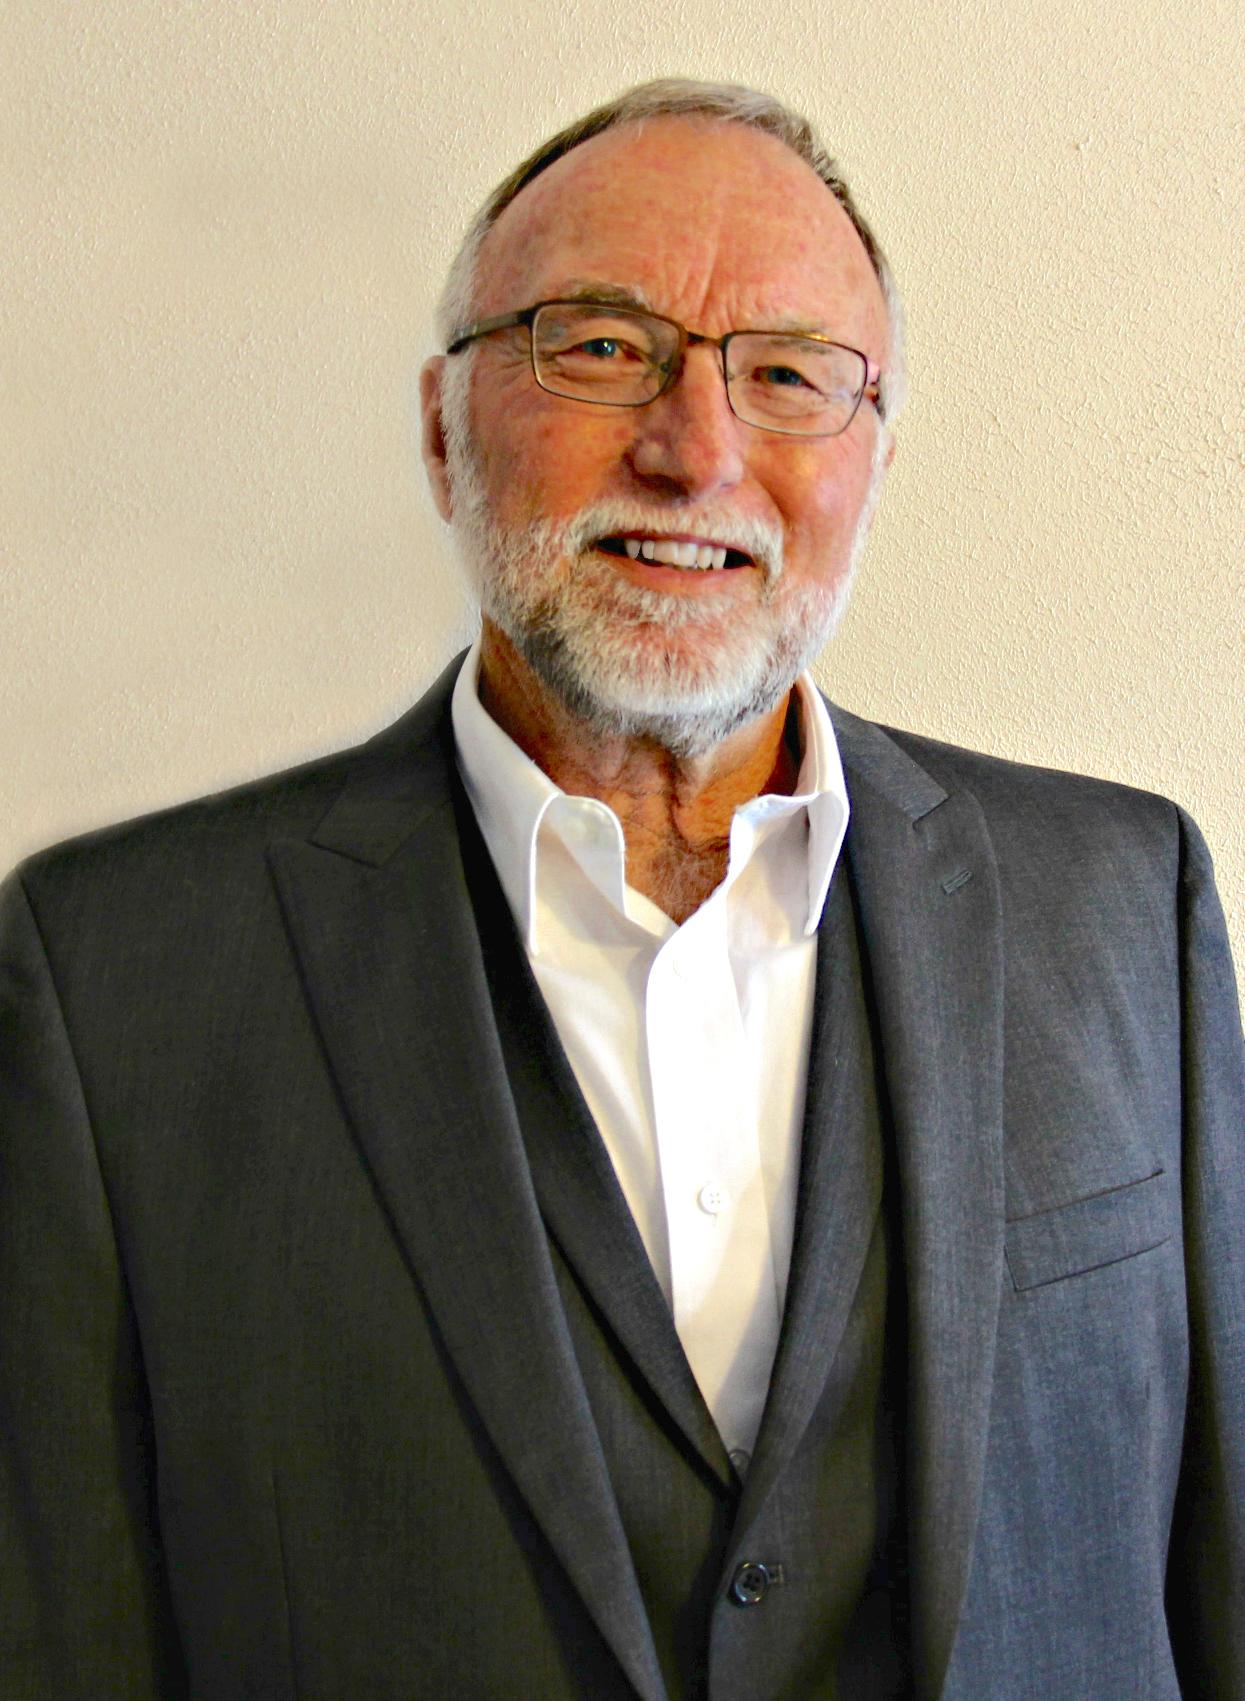 Randall T. Jose